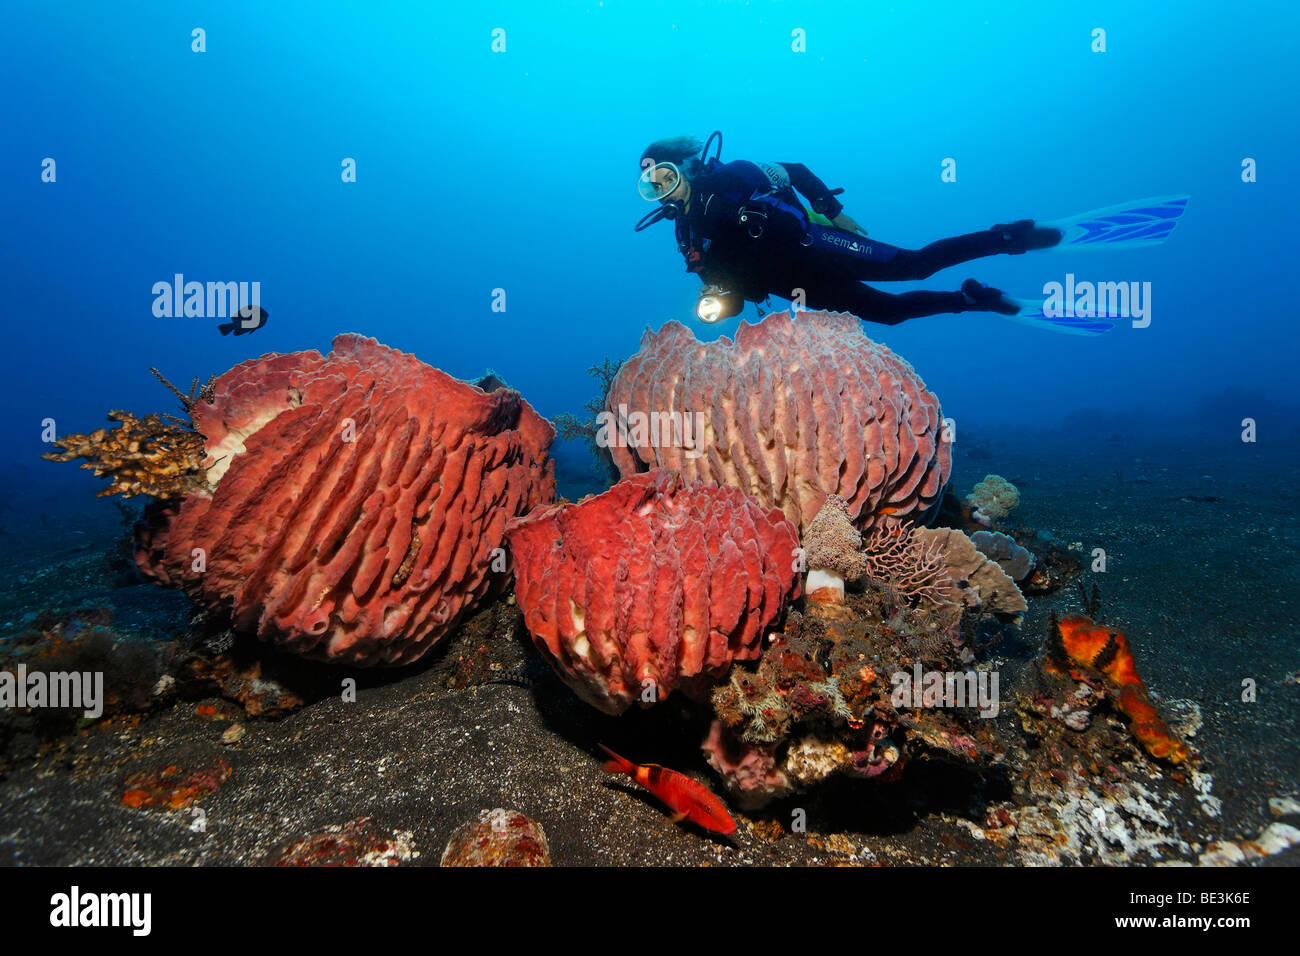 Diver looking at some magnificent Giant barrel sponges (Xestospongia testudinaria), Kuda, Bali, Indonesia, Pacific - Stock Image